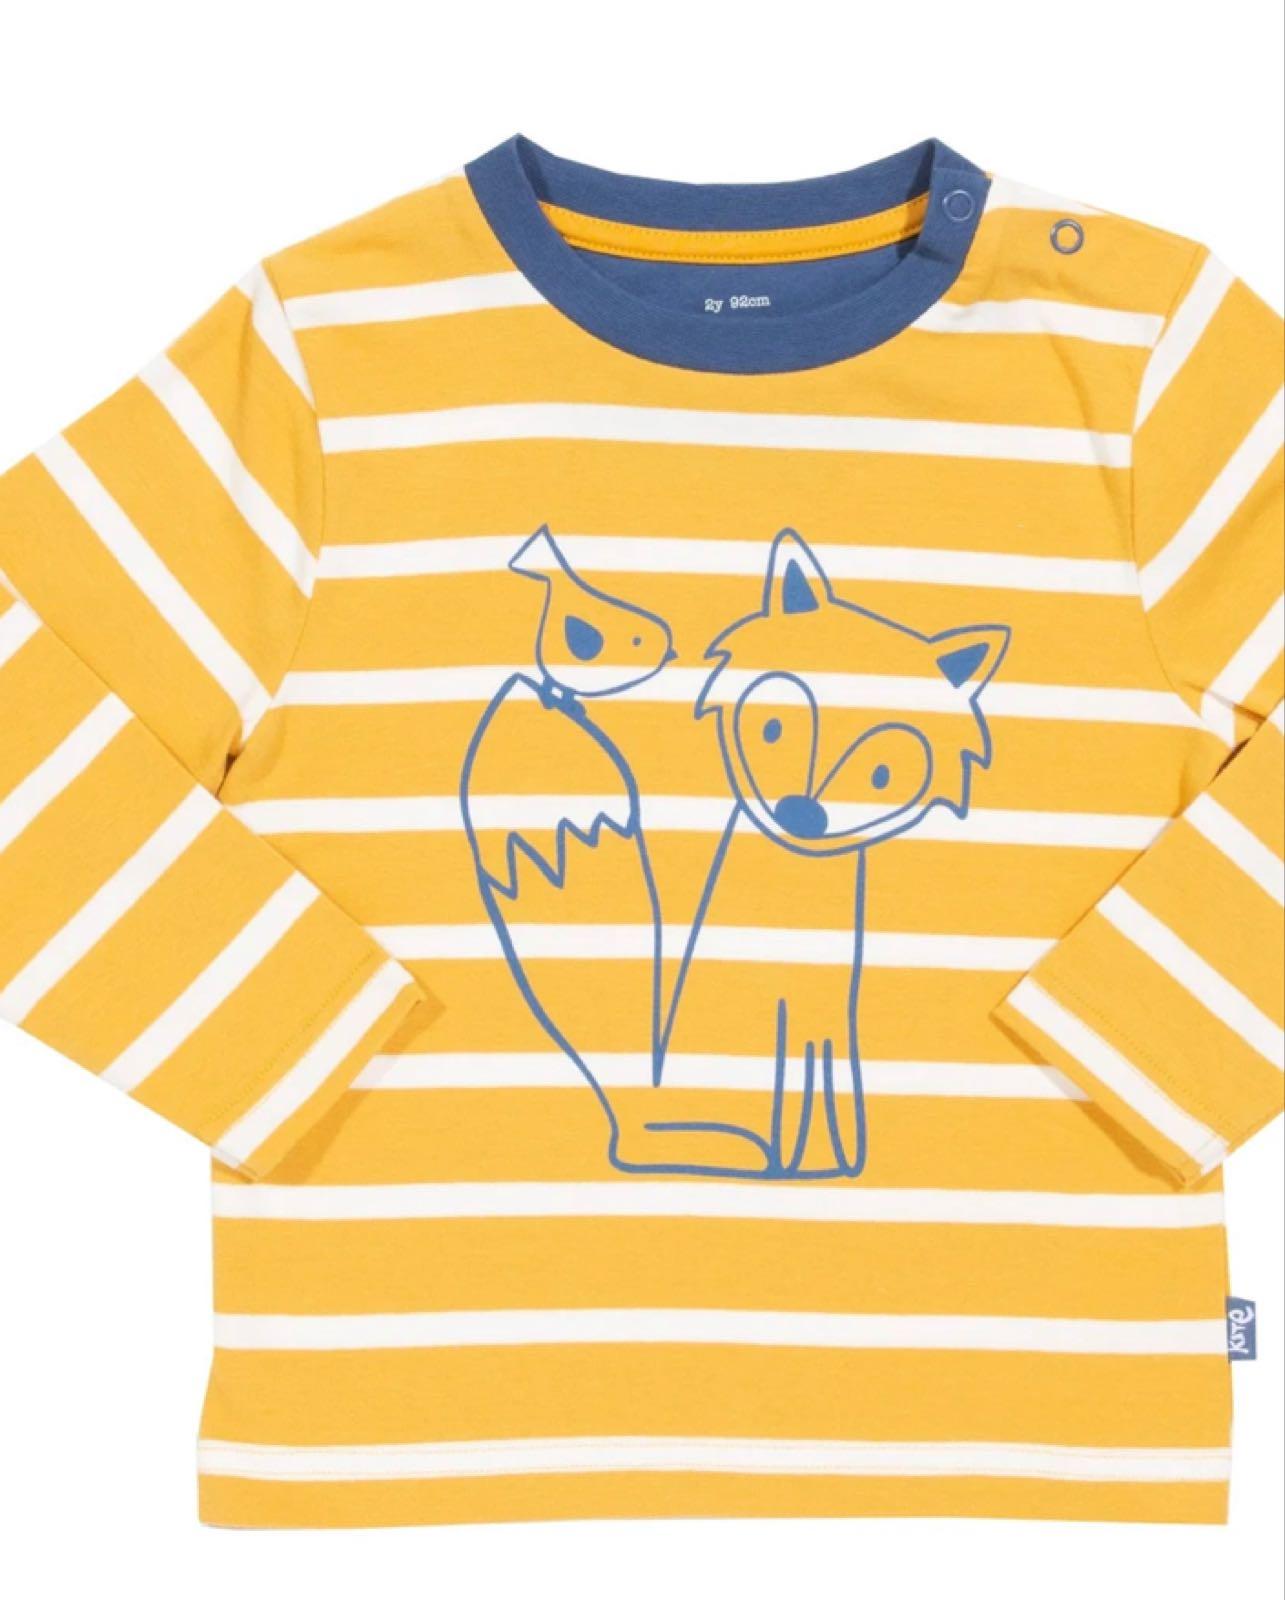 Little cub t shirt